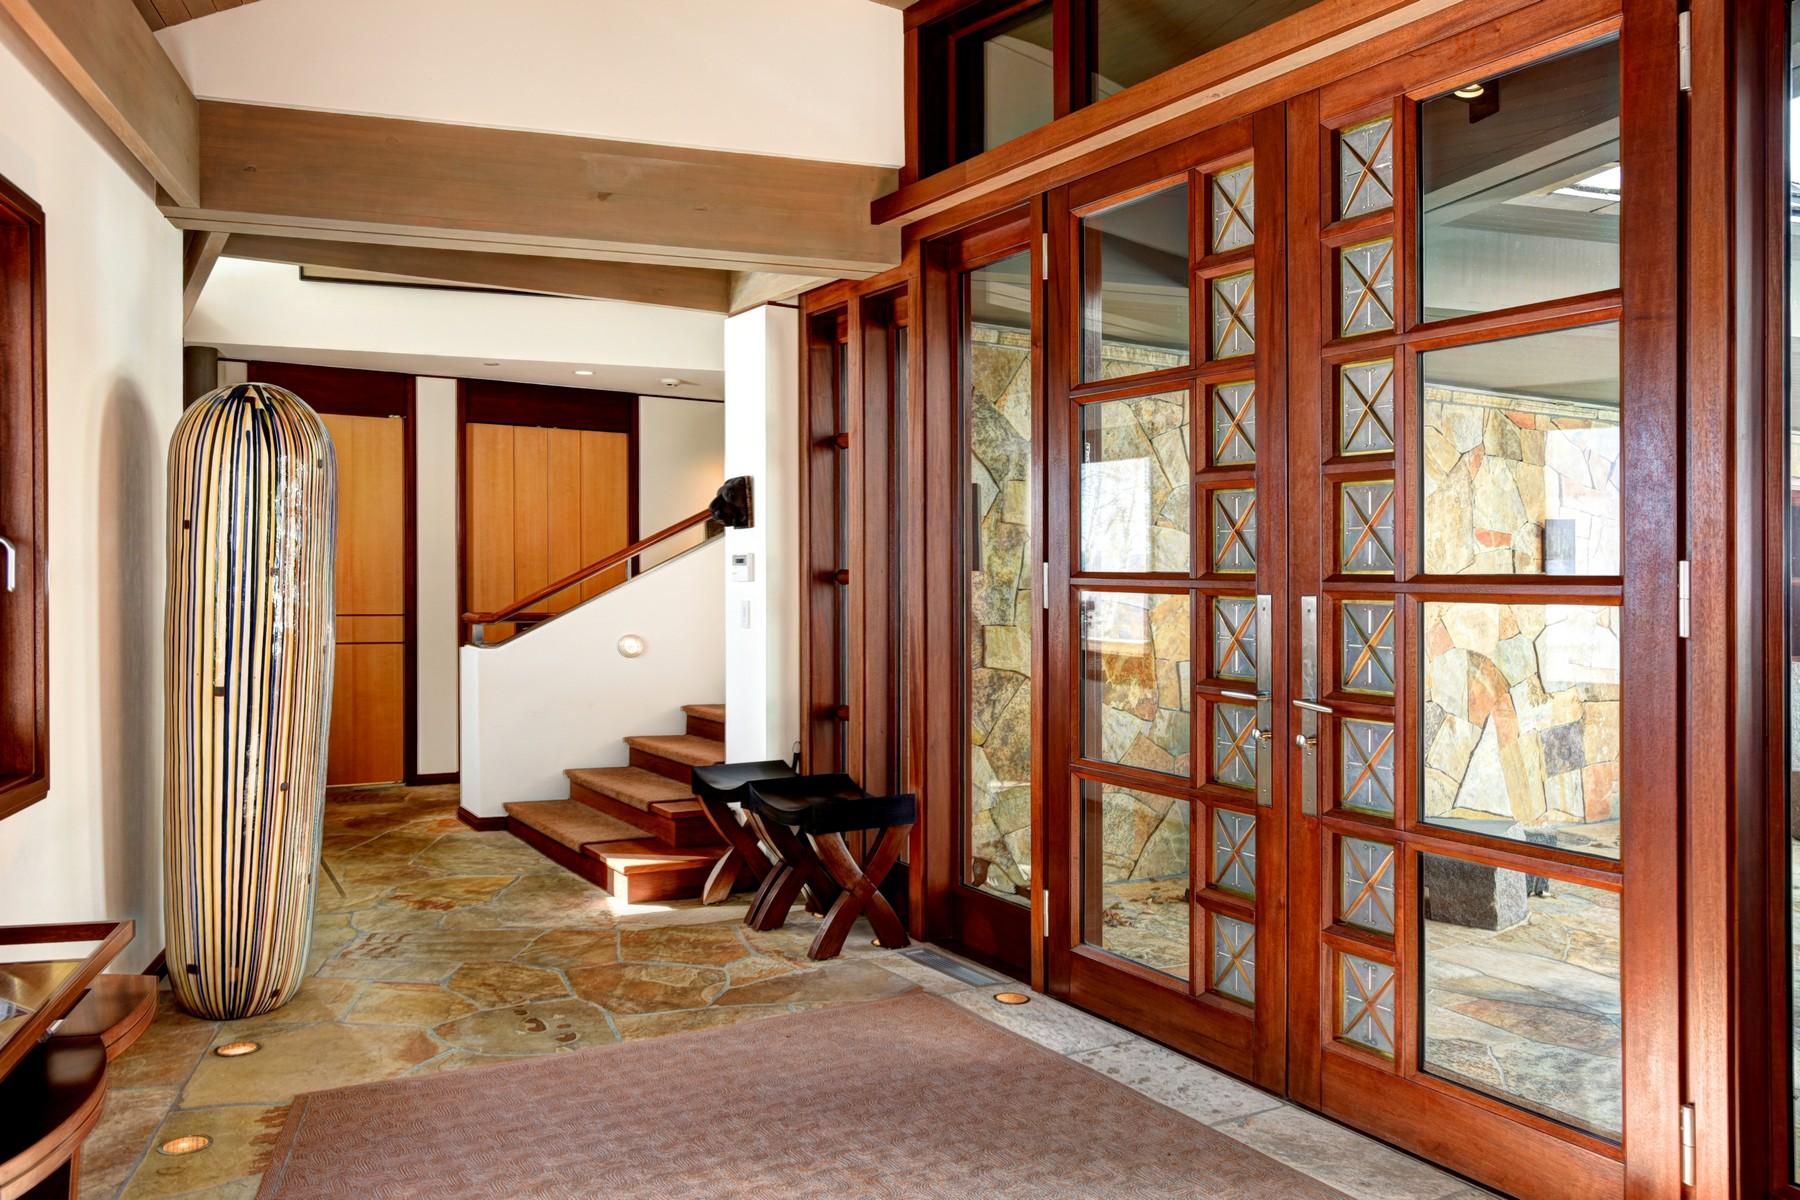 Additional photo for property listing at 56 Rose Crown  Beaver Creek, Colorado 81620 Estados Unidos